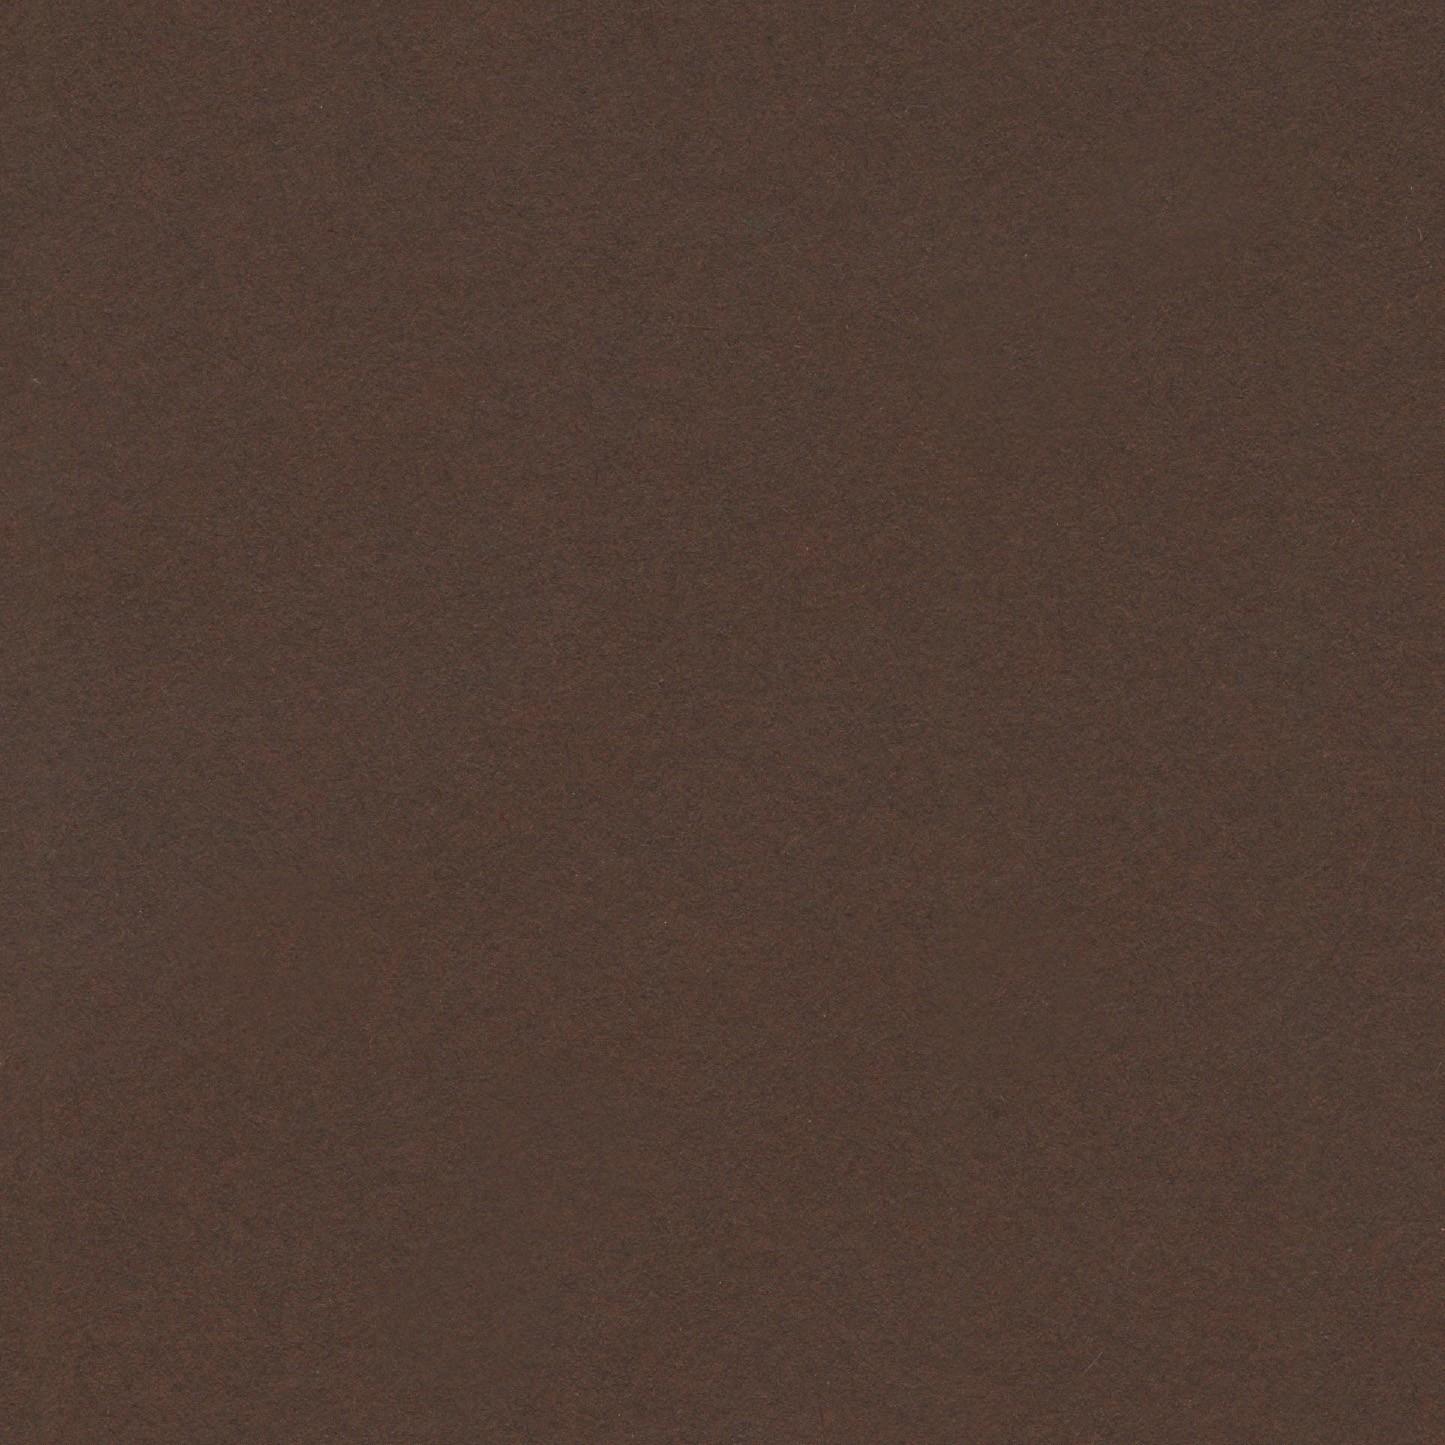 Brown - Dark 135gsm